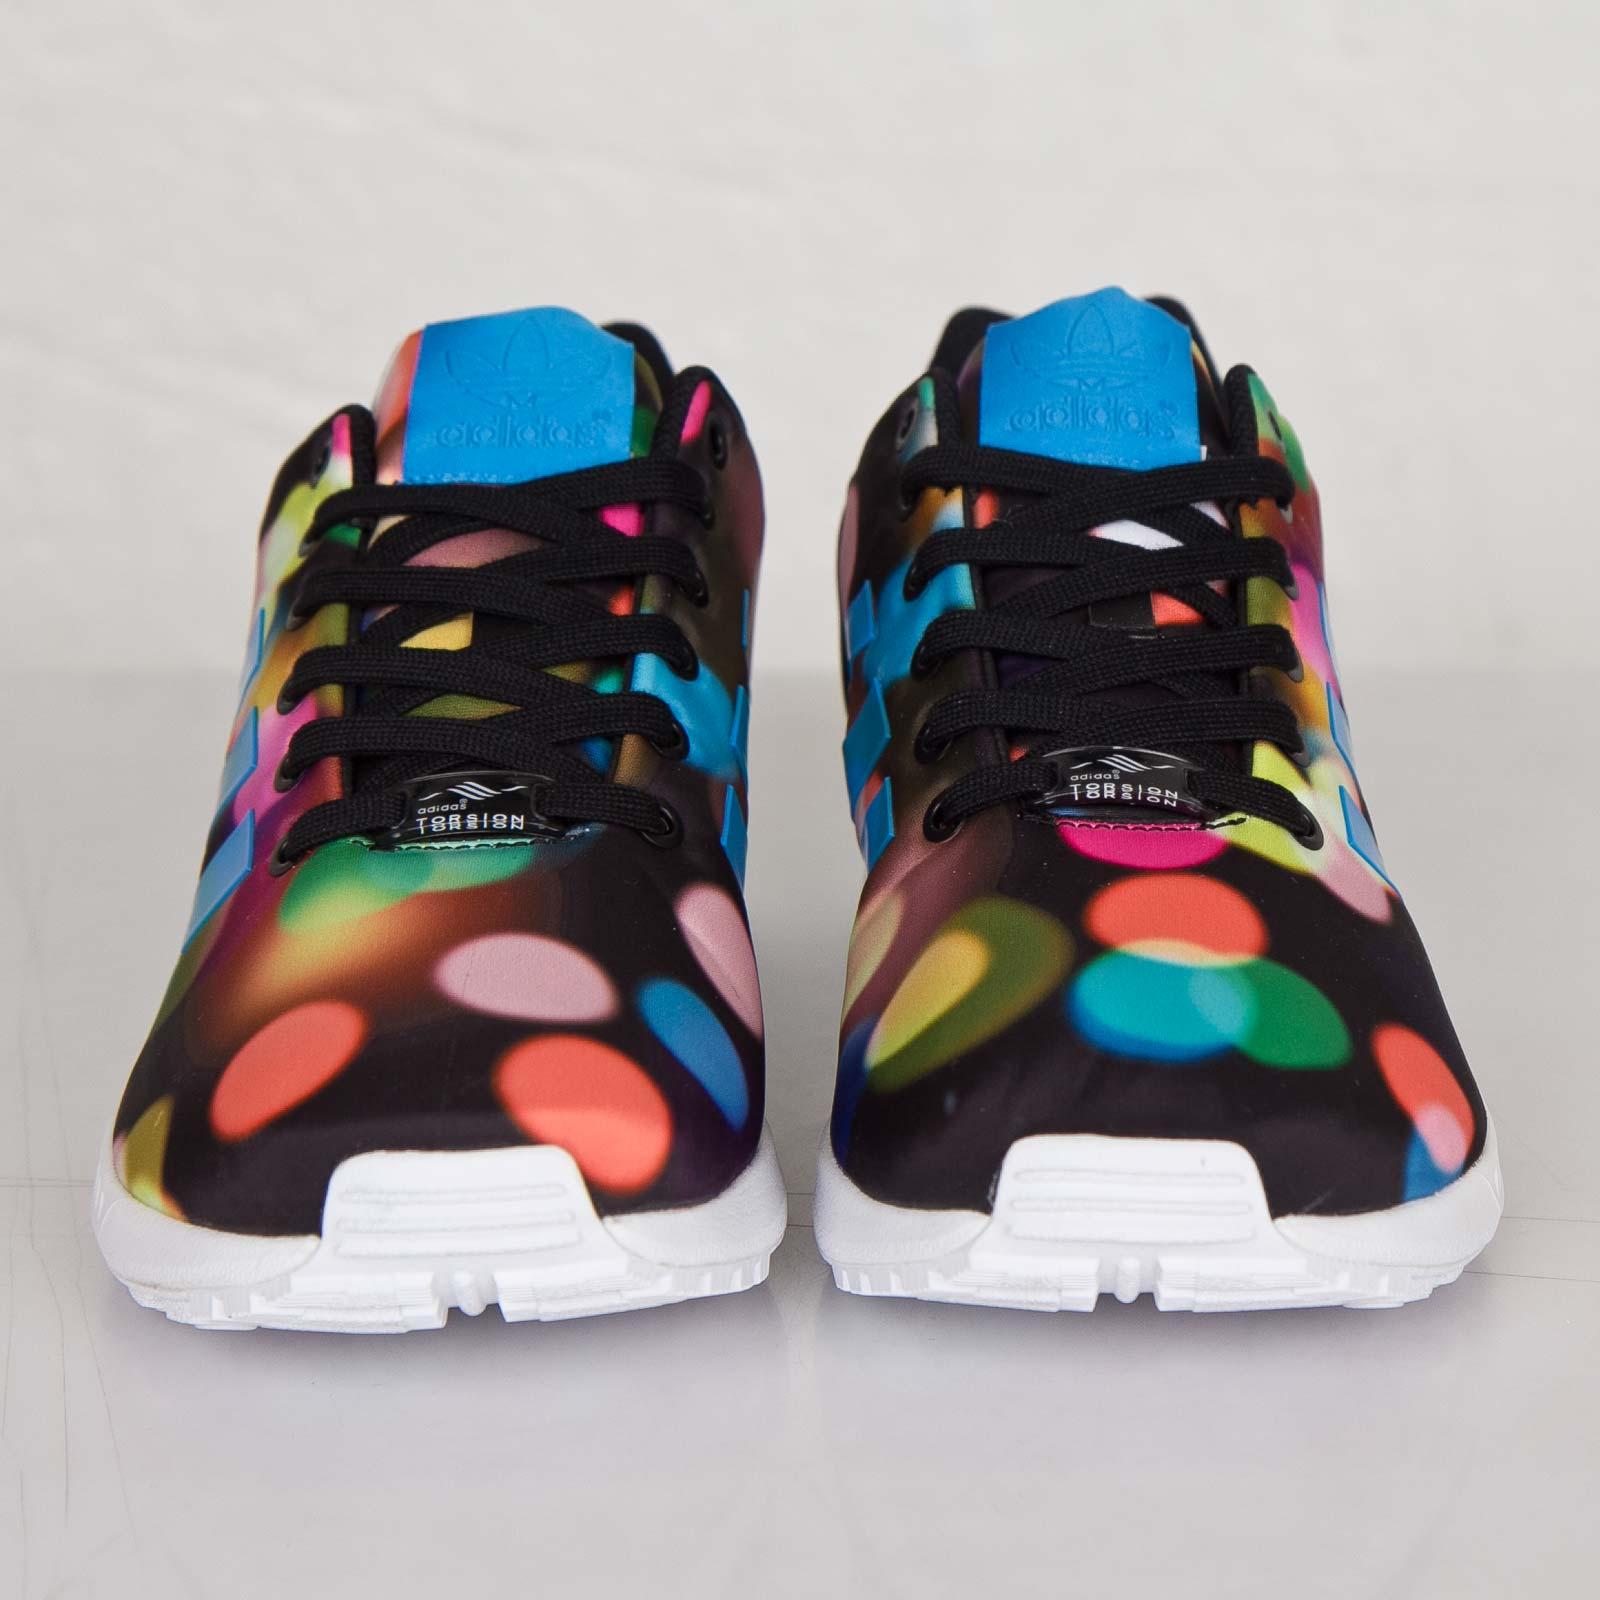 afd7eb3c7 adidas ZX Flux - B23984 - Sneakersnstuff